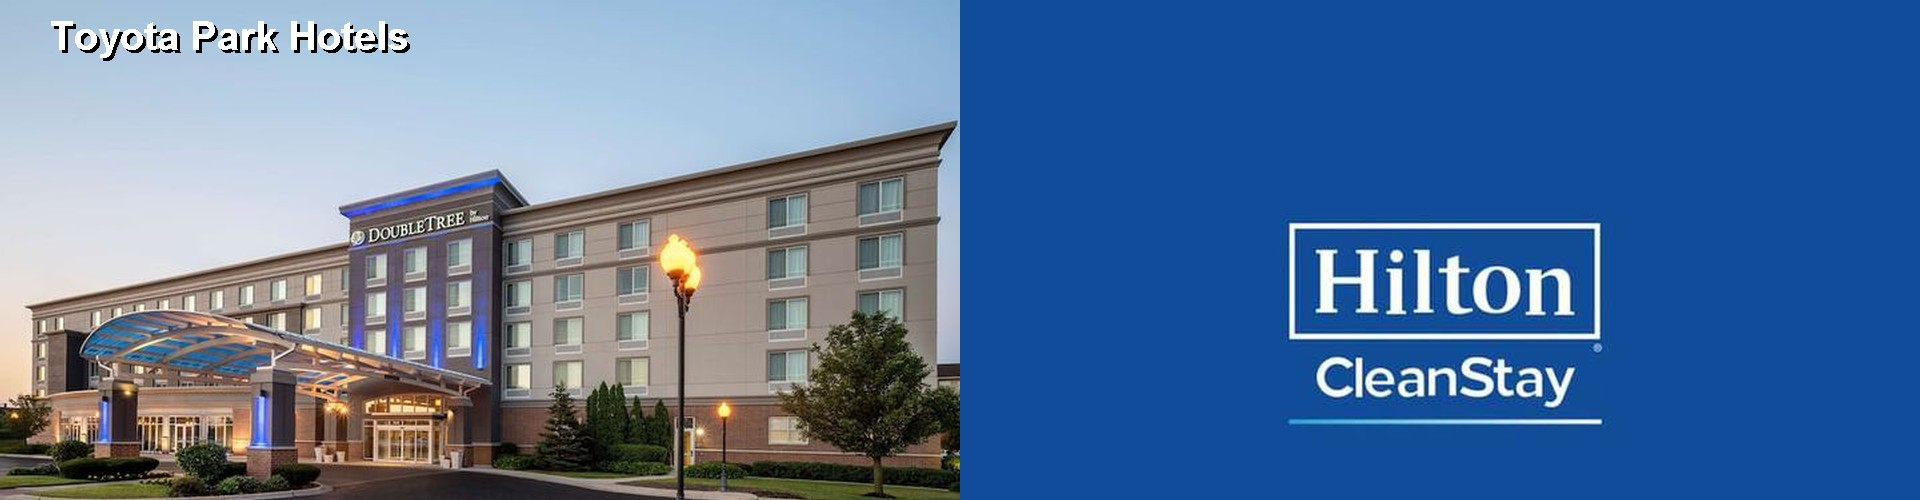 $48+ Hotels Near Toyota Park in Bridgeview IL